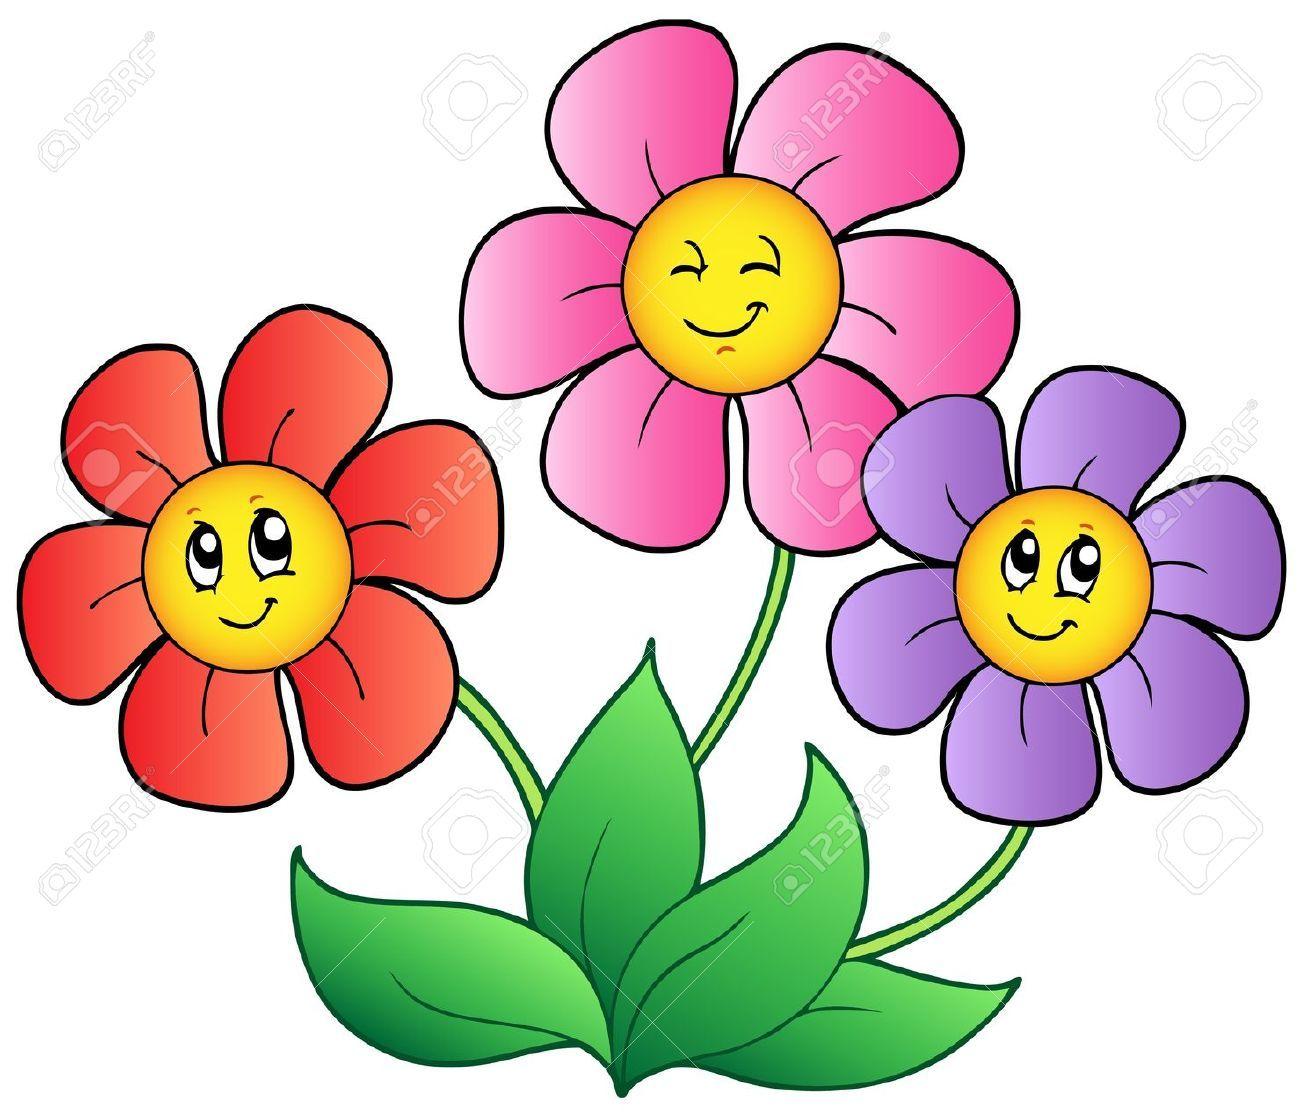 ARBOL de primavera PARA COLOREAR infantil - Buscar con Google | Cartoon  flowers, Flower drawing, Simple cartoon